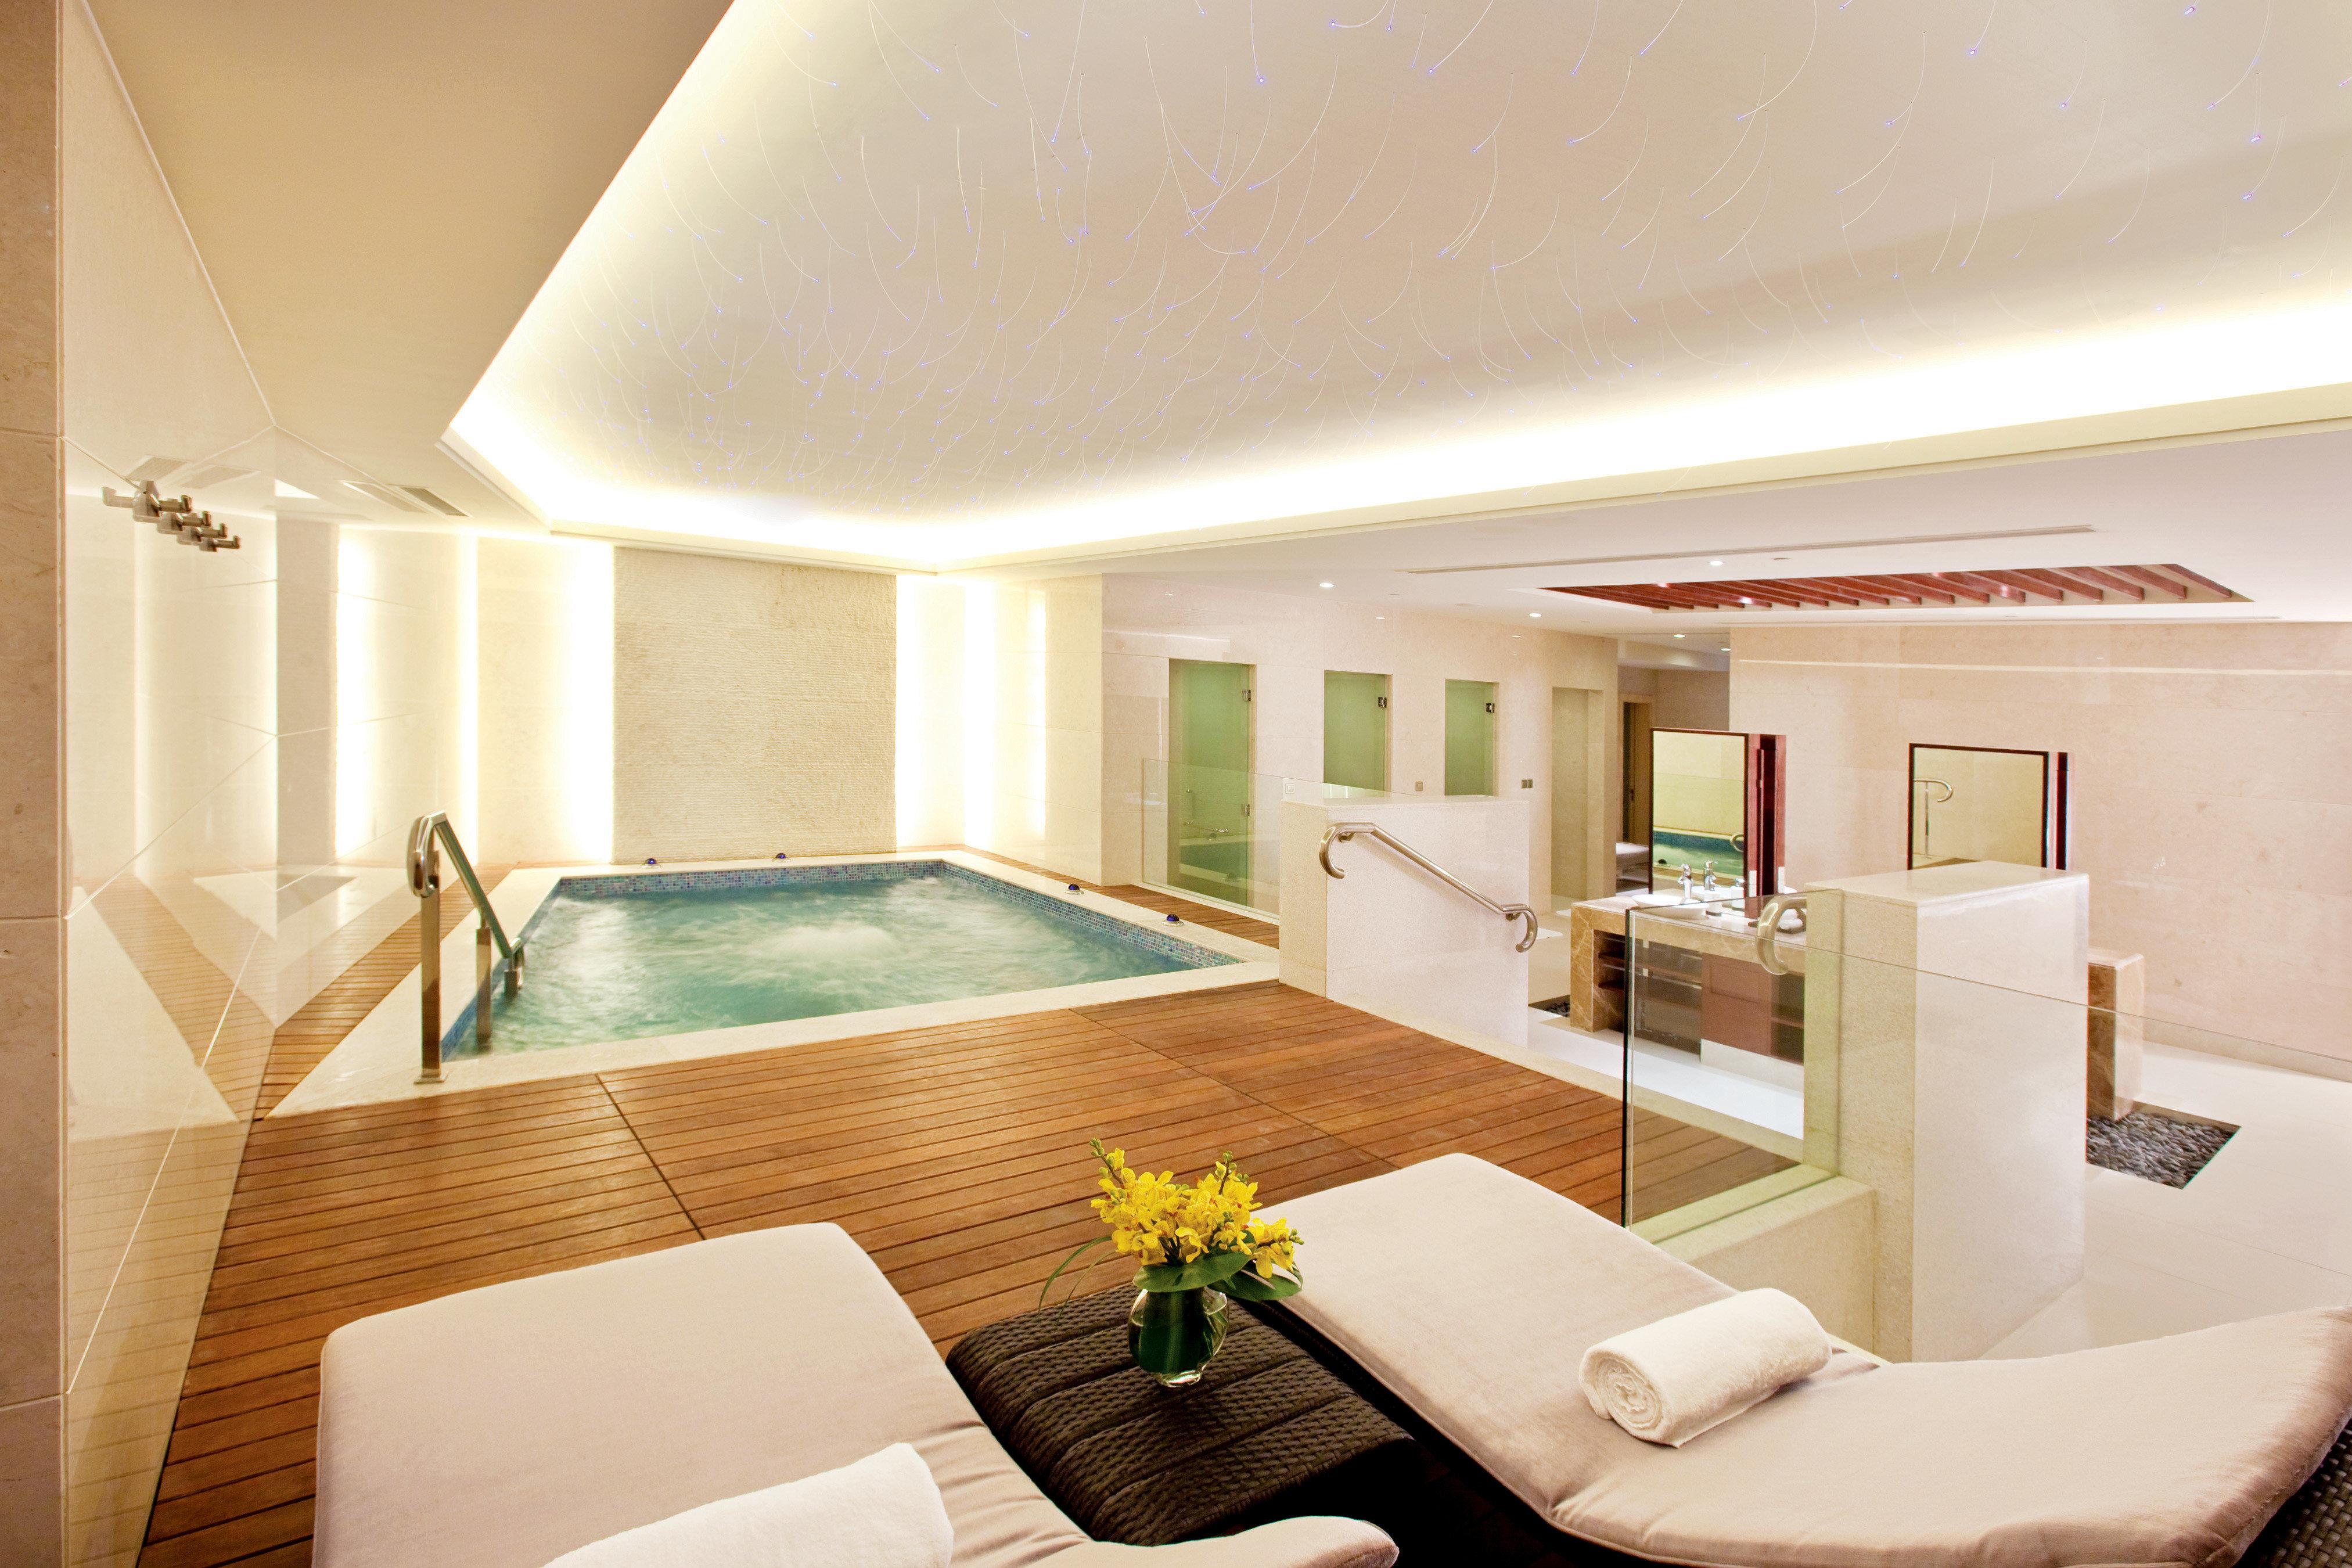 Deck Hip Luxury Modern Pool property house Suite living room condominium home Villa daylighting Bedroom